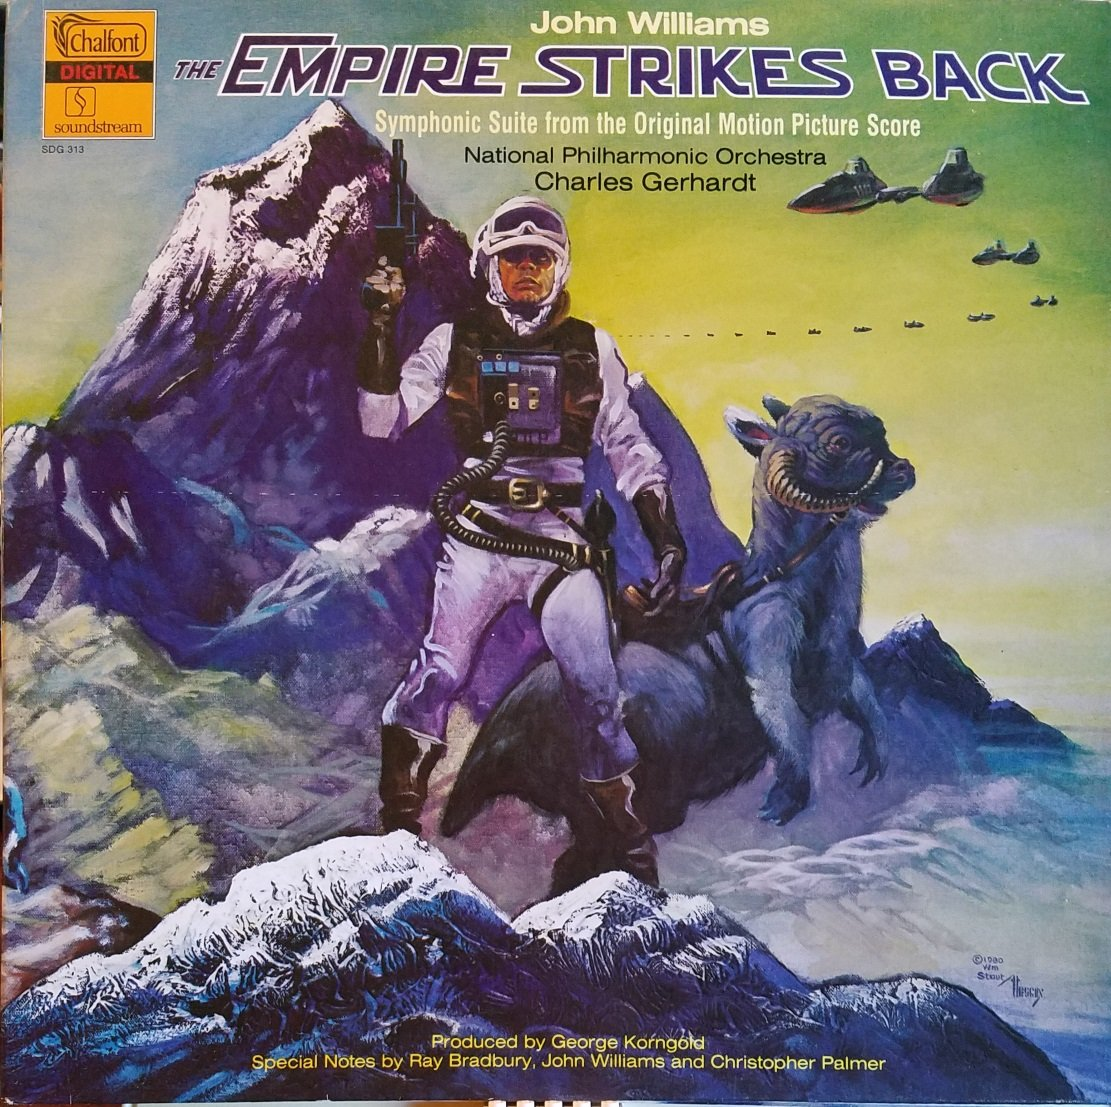 The Empire Strikes Back Symphonic Suite, National Philharmonic